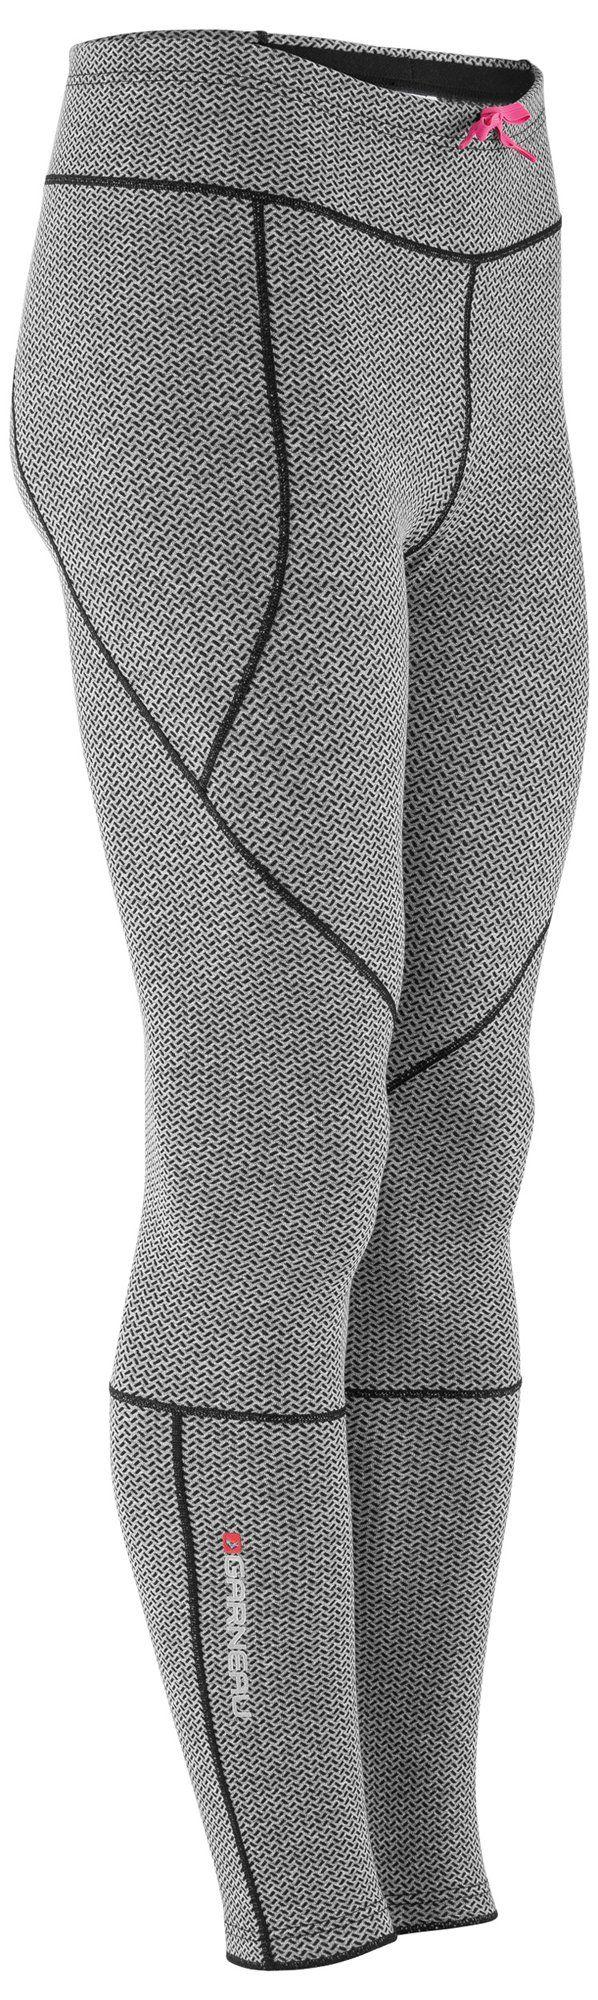 Louis Garneau Women's Stockholm Tights, Iron Gray/Asphalt, LG X One Size